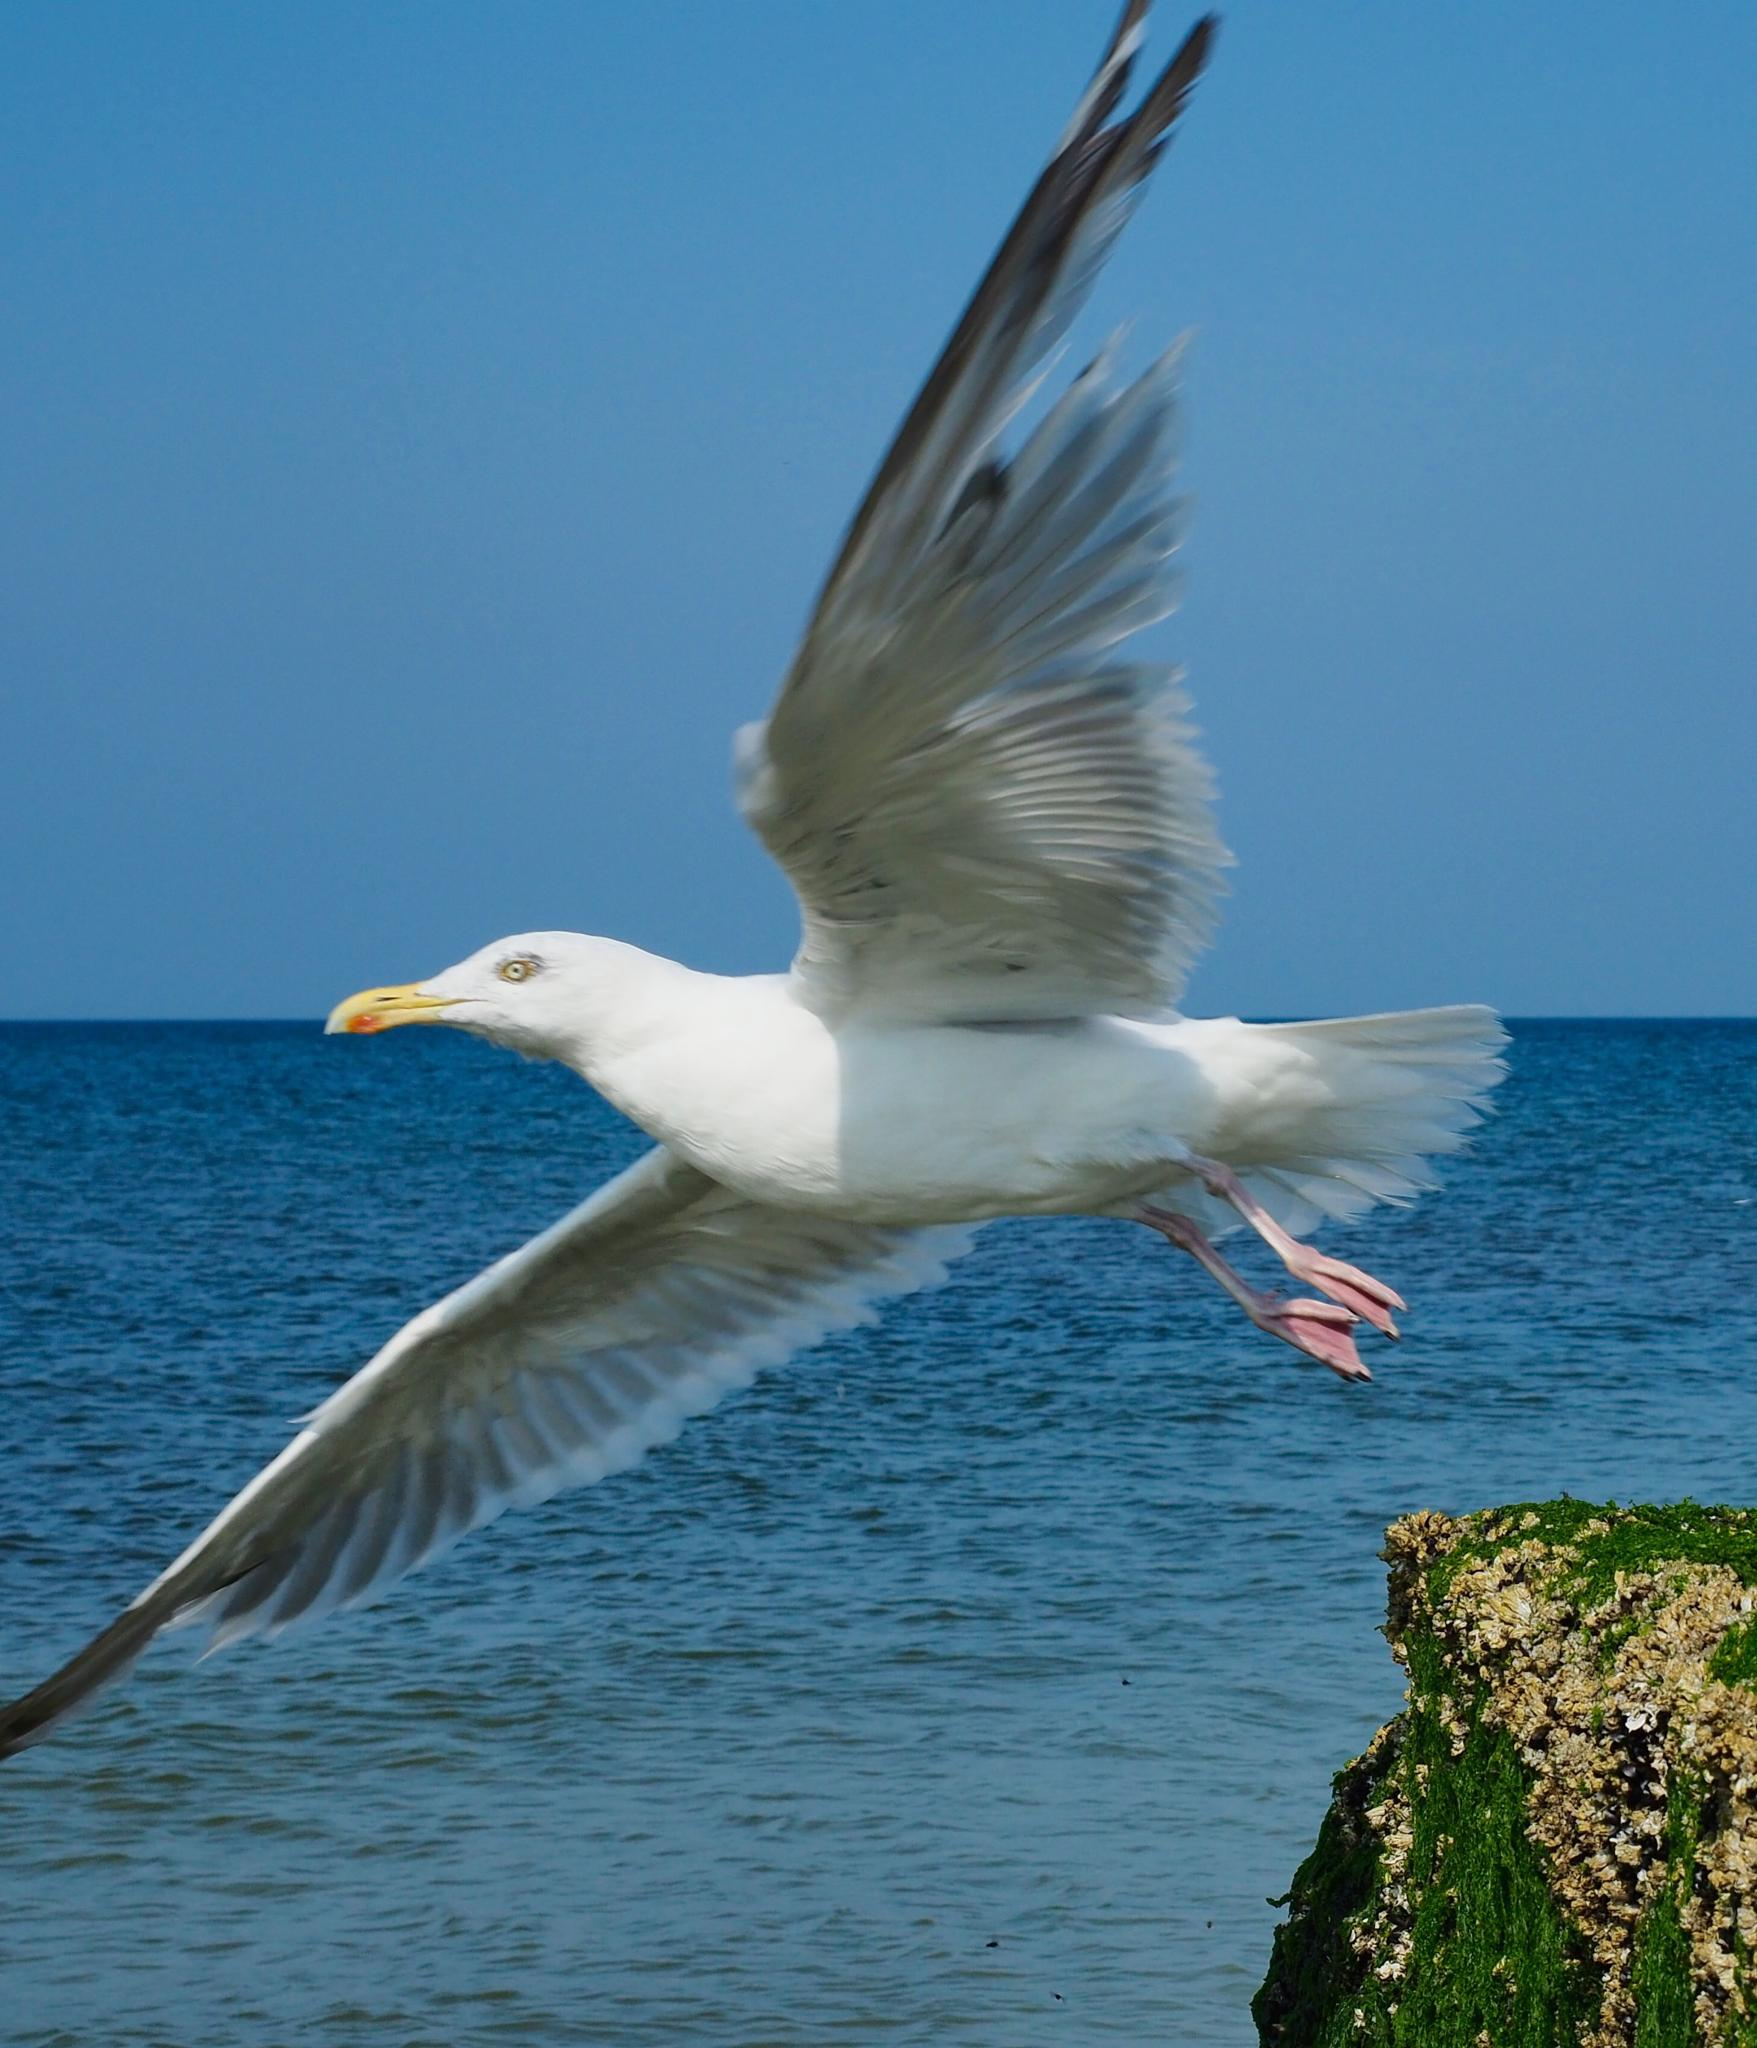 Take Off of a Seagull by henningwaschk